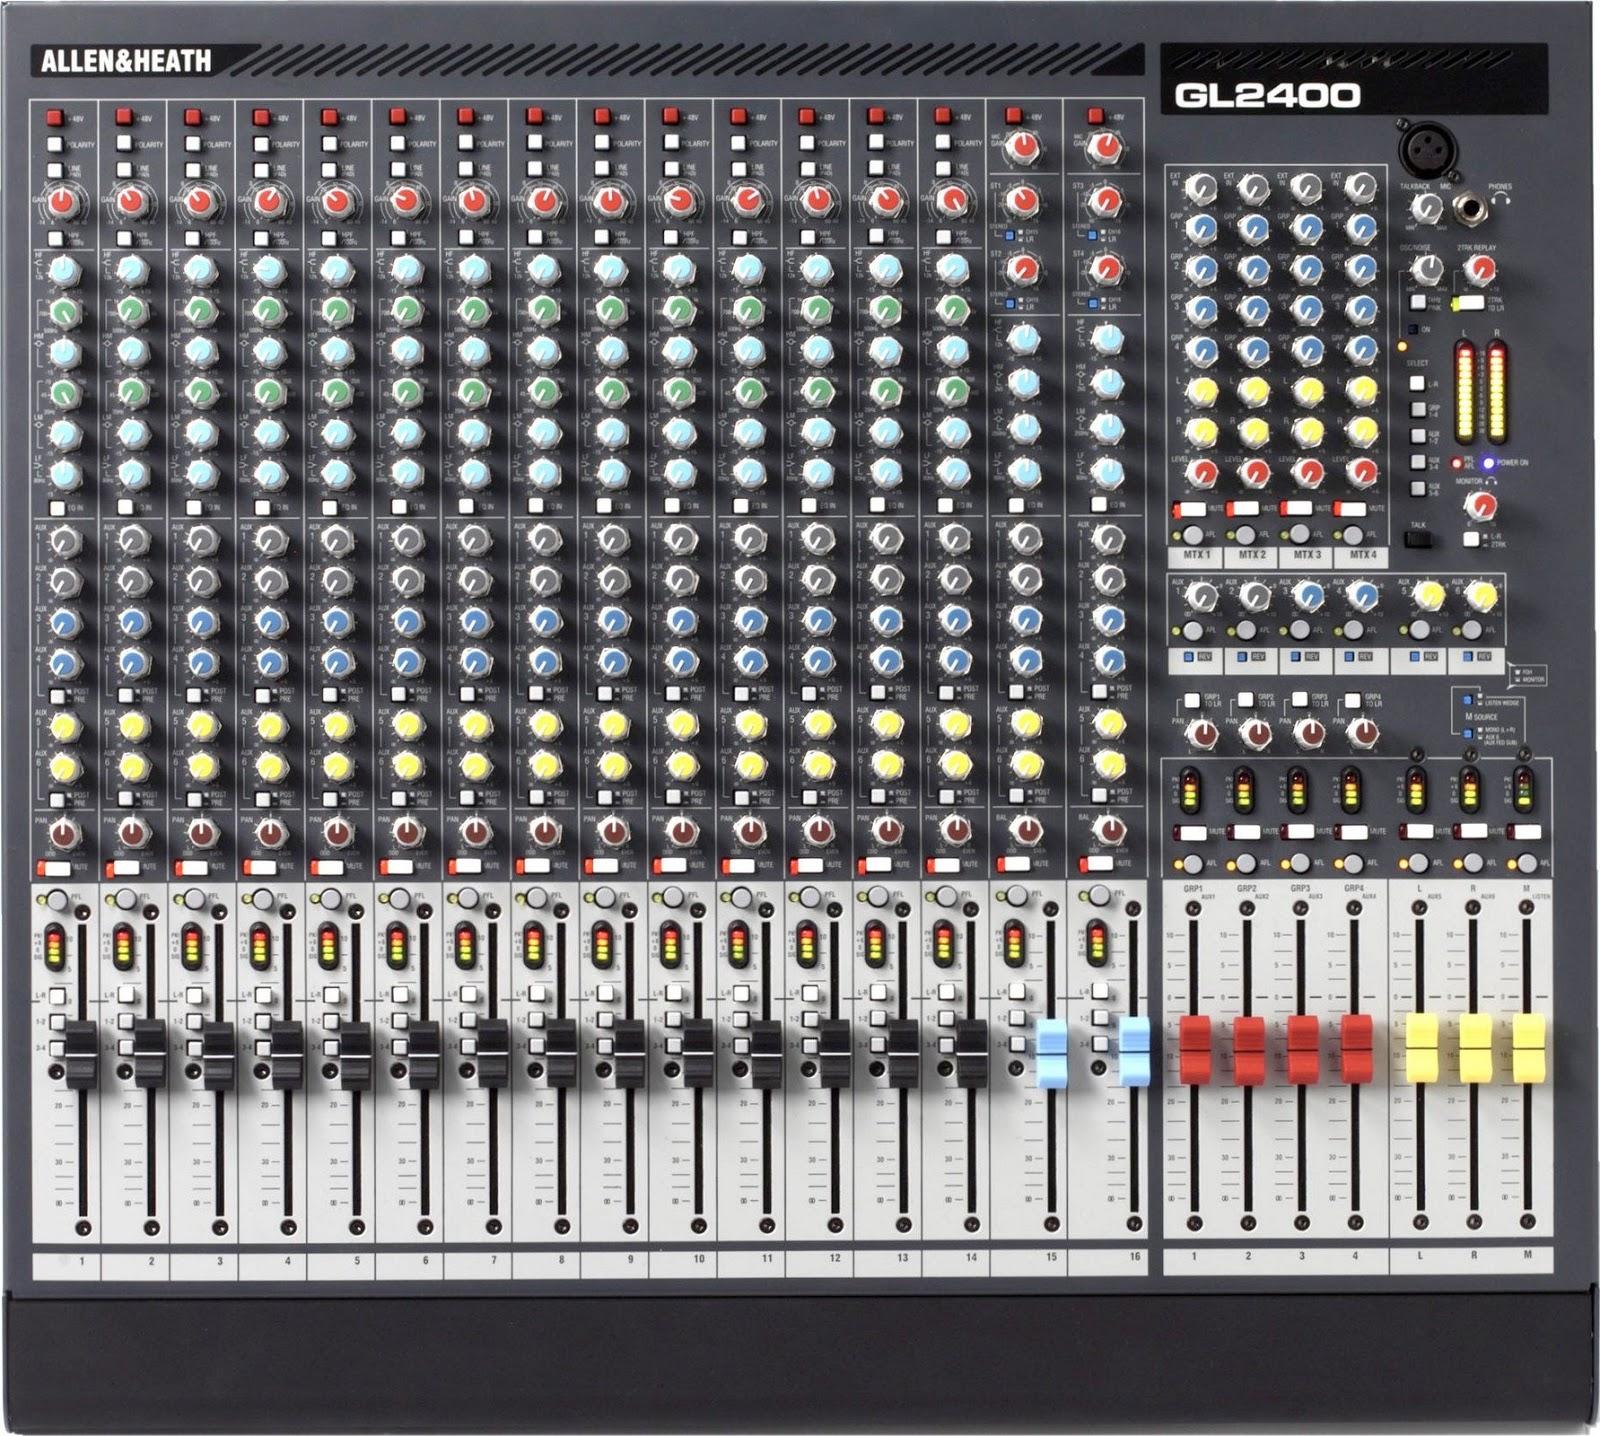 Luxury Audio Mixer Layout Dan Skema Inspiration - The Best ...